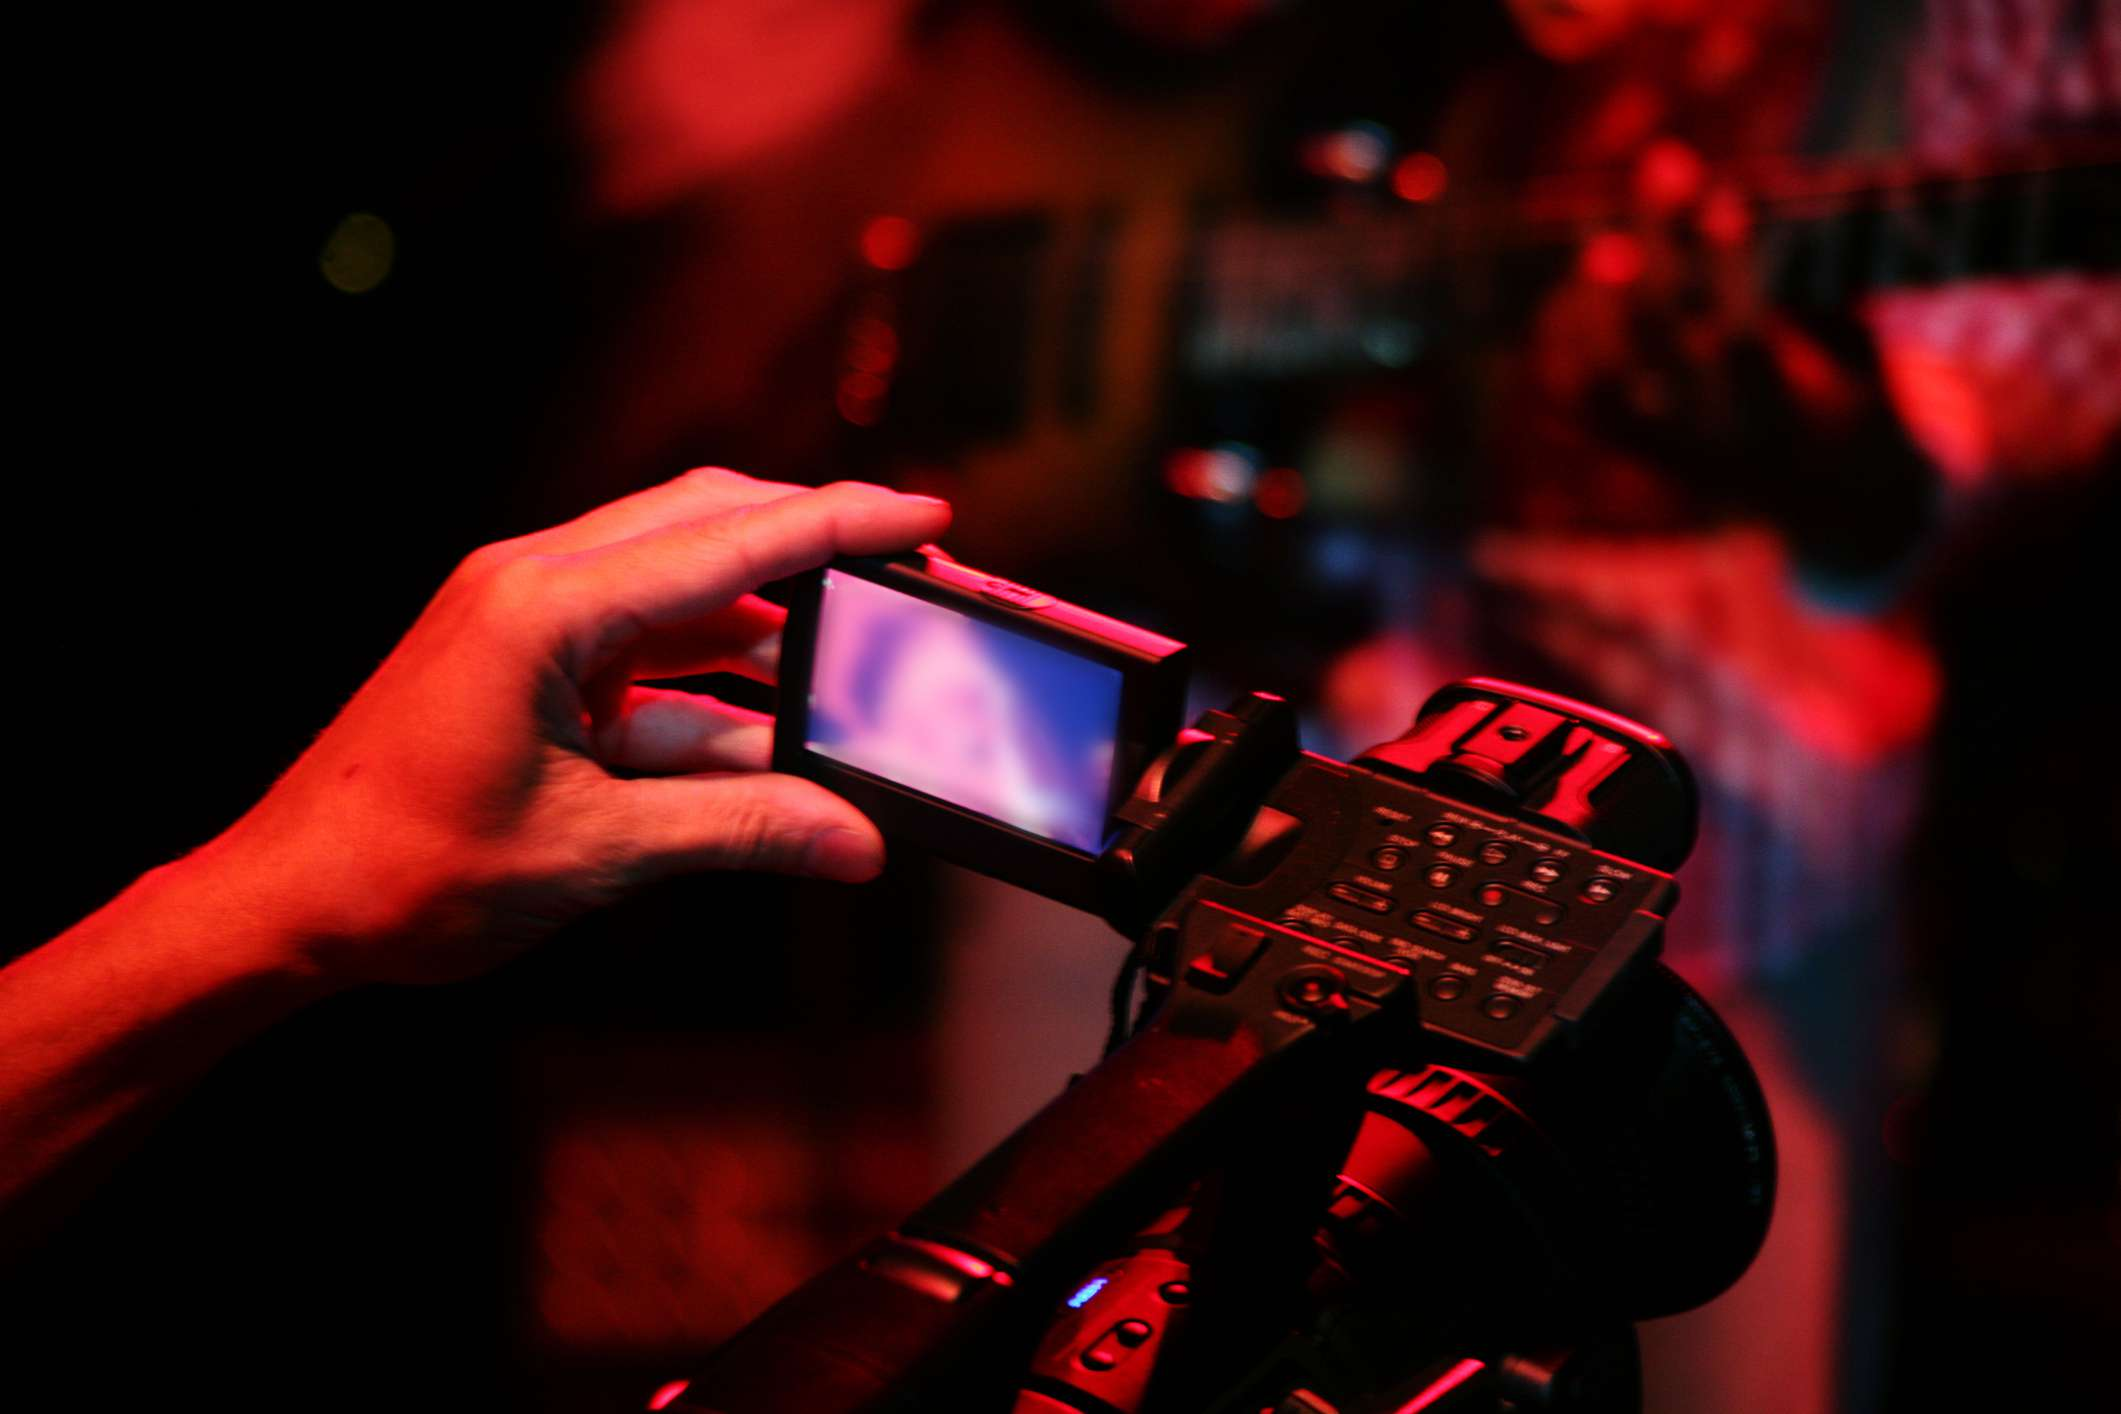 USA, New York City, Singer in camera